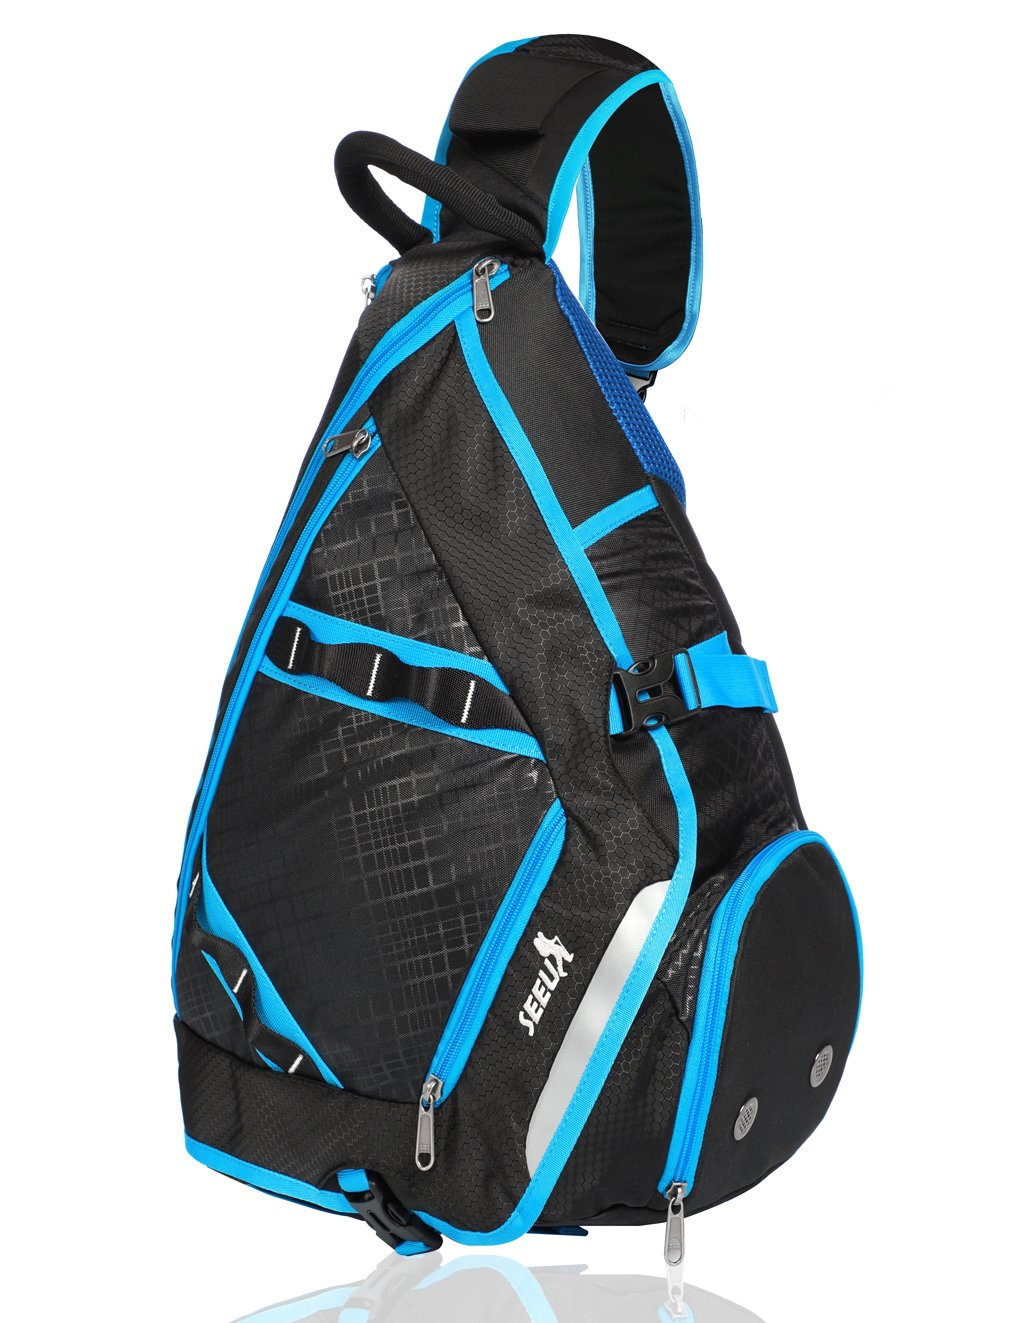 SEEU 32L Oversized Sling Backpack, Crossbody Chest Gym Backpack Outdoor Hiking Travel Bag for Men Women Kids